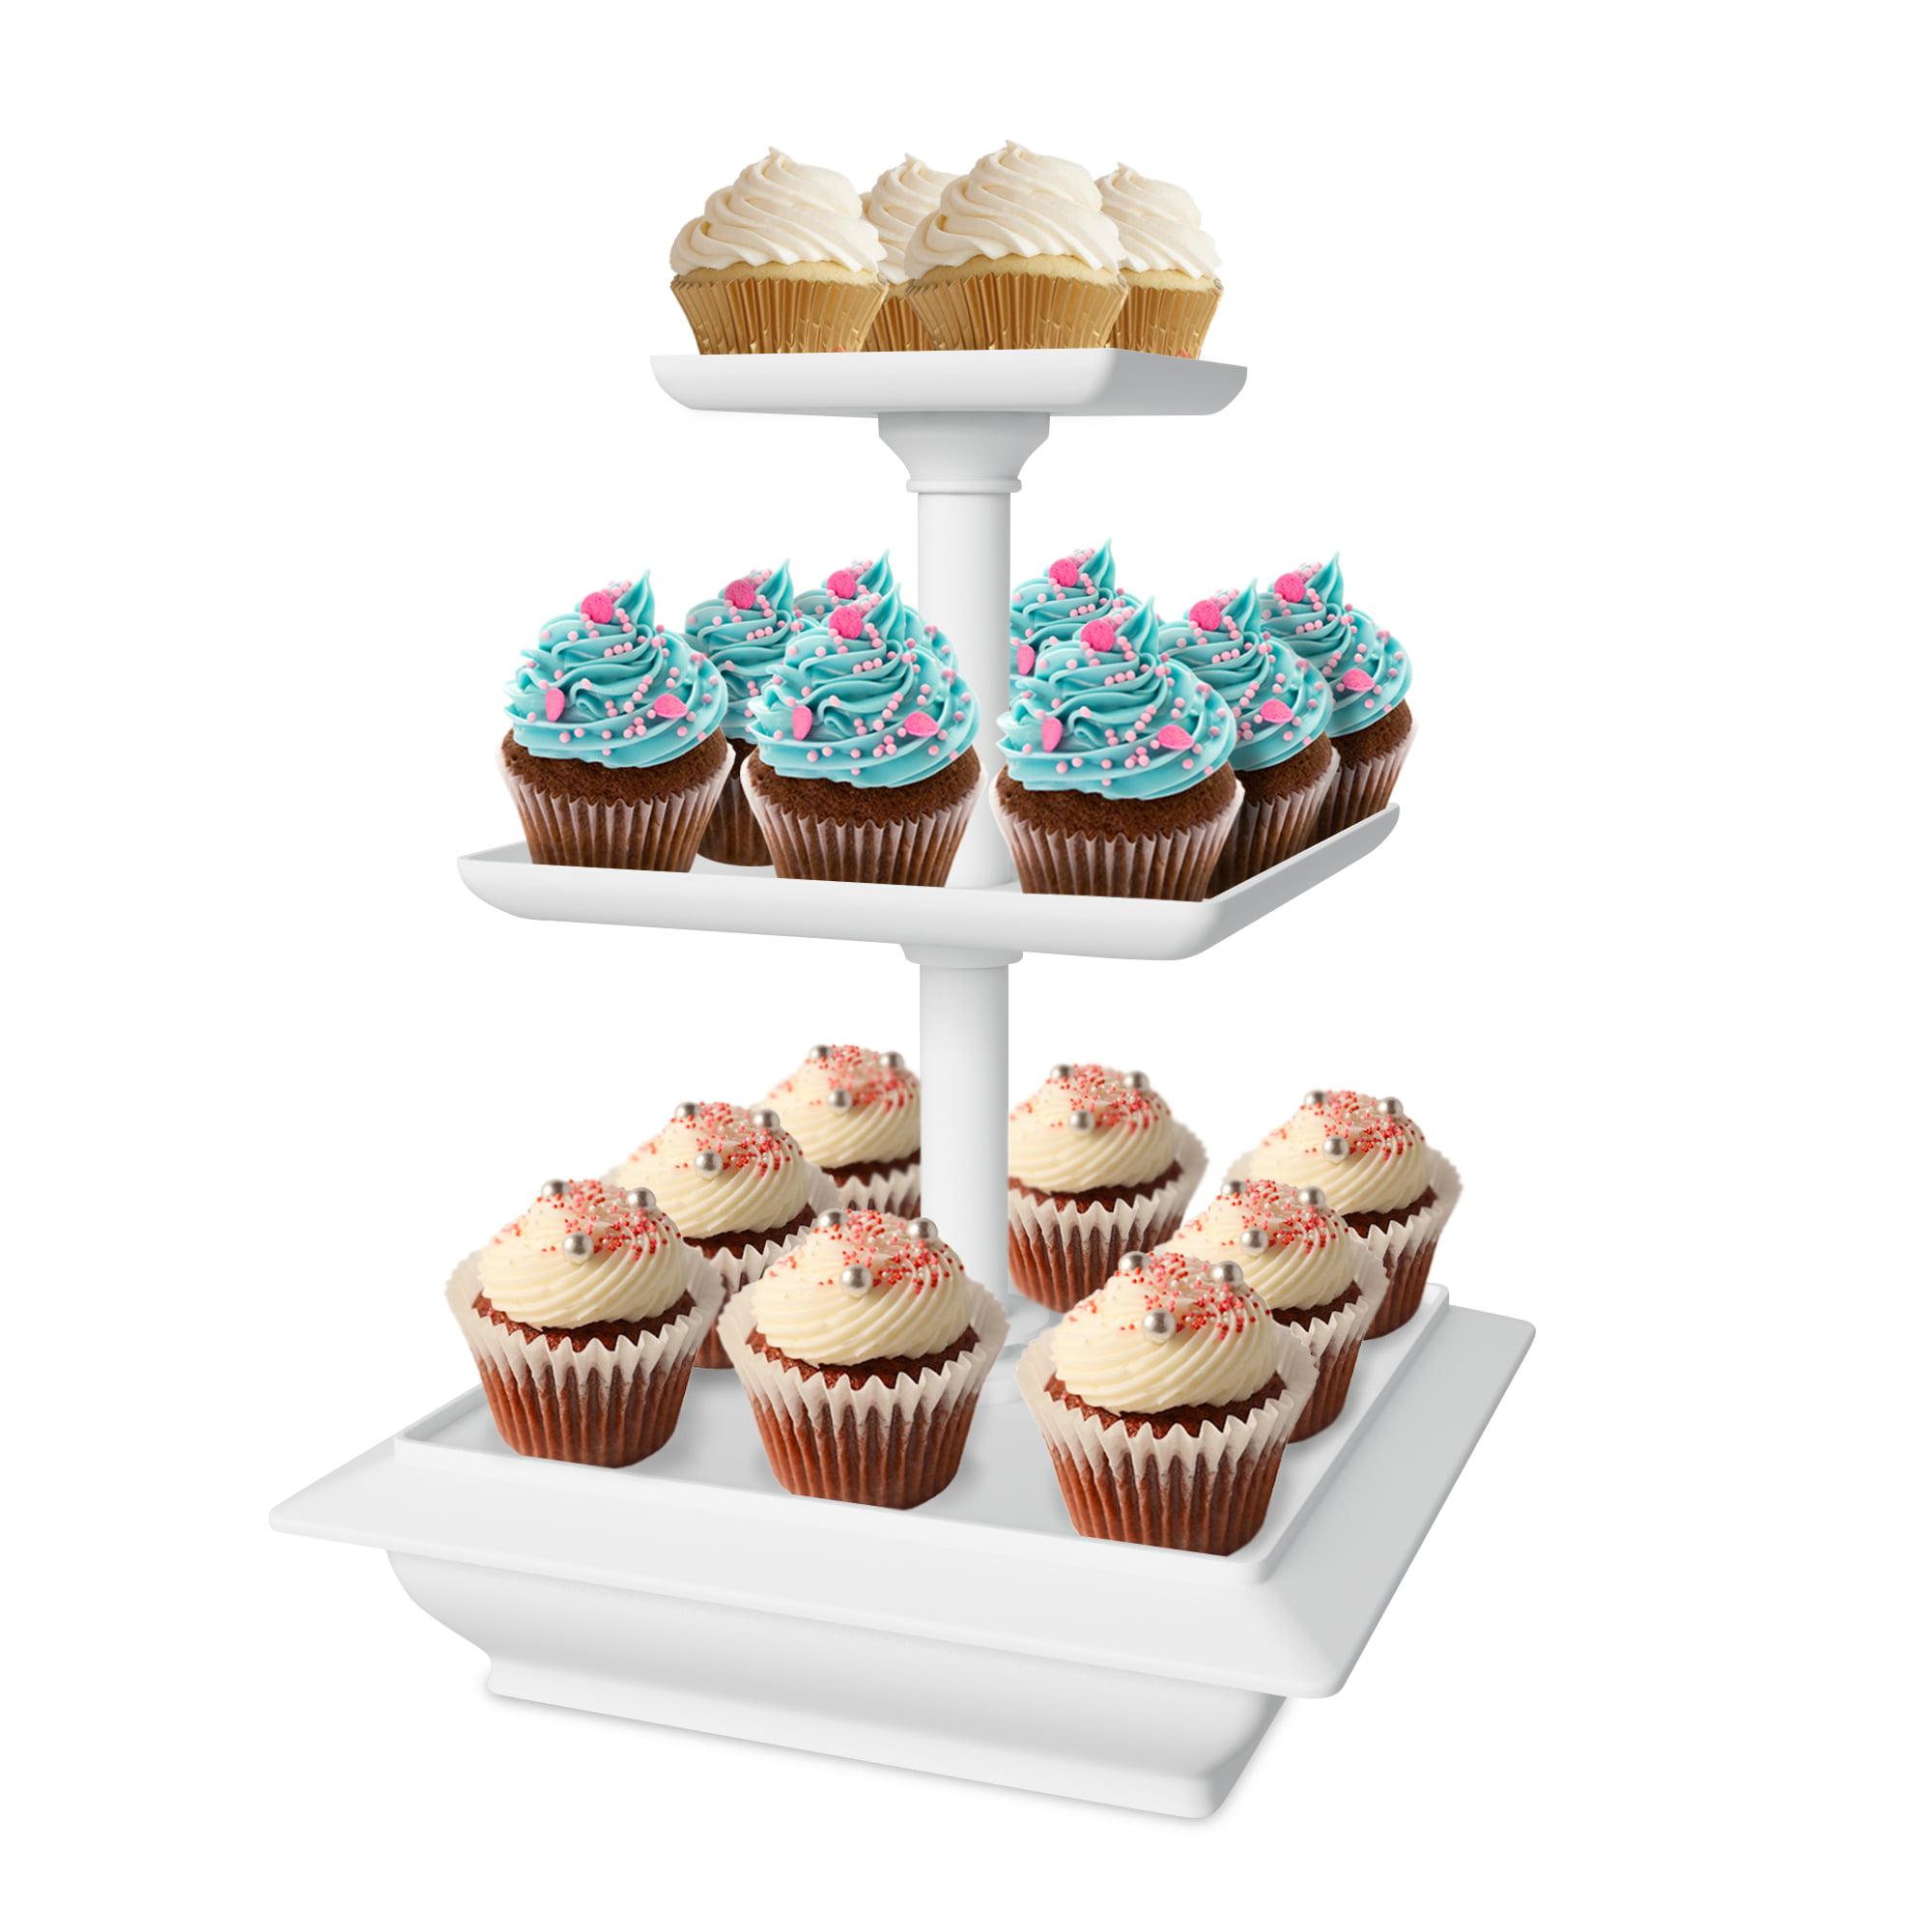 Image Result For Porcelain Tier Cake Stand